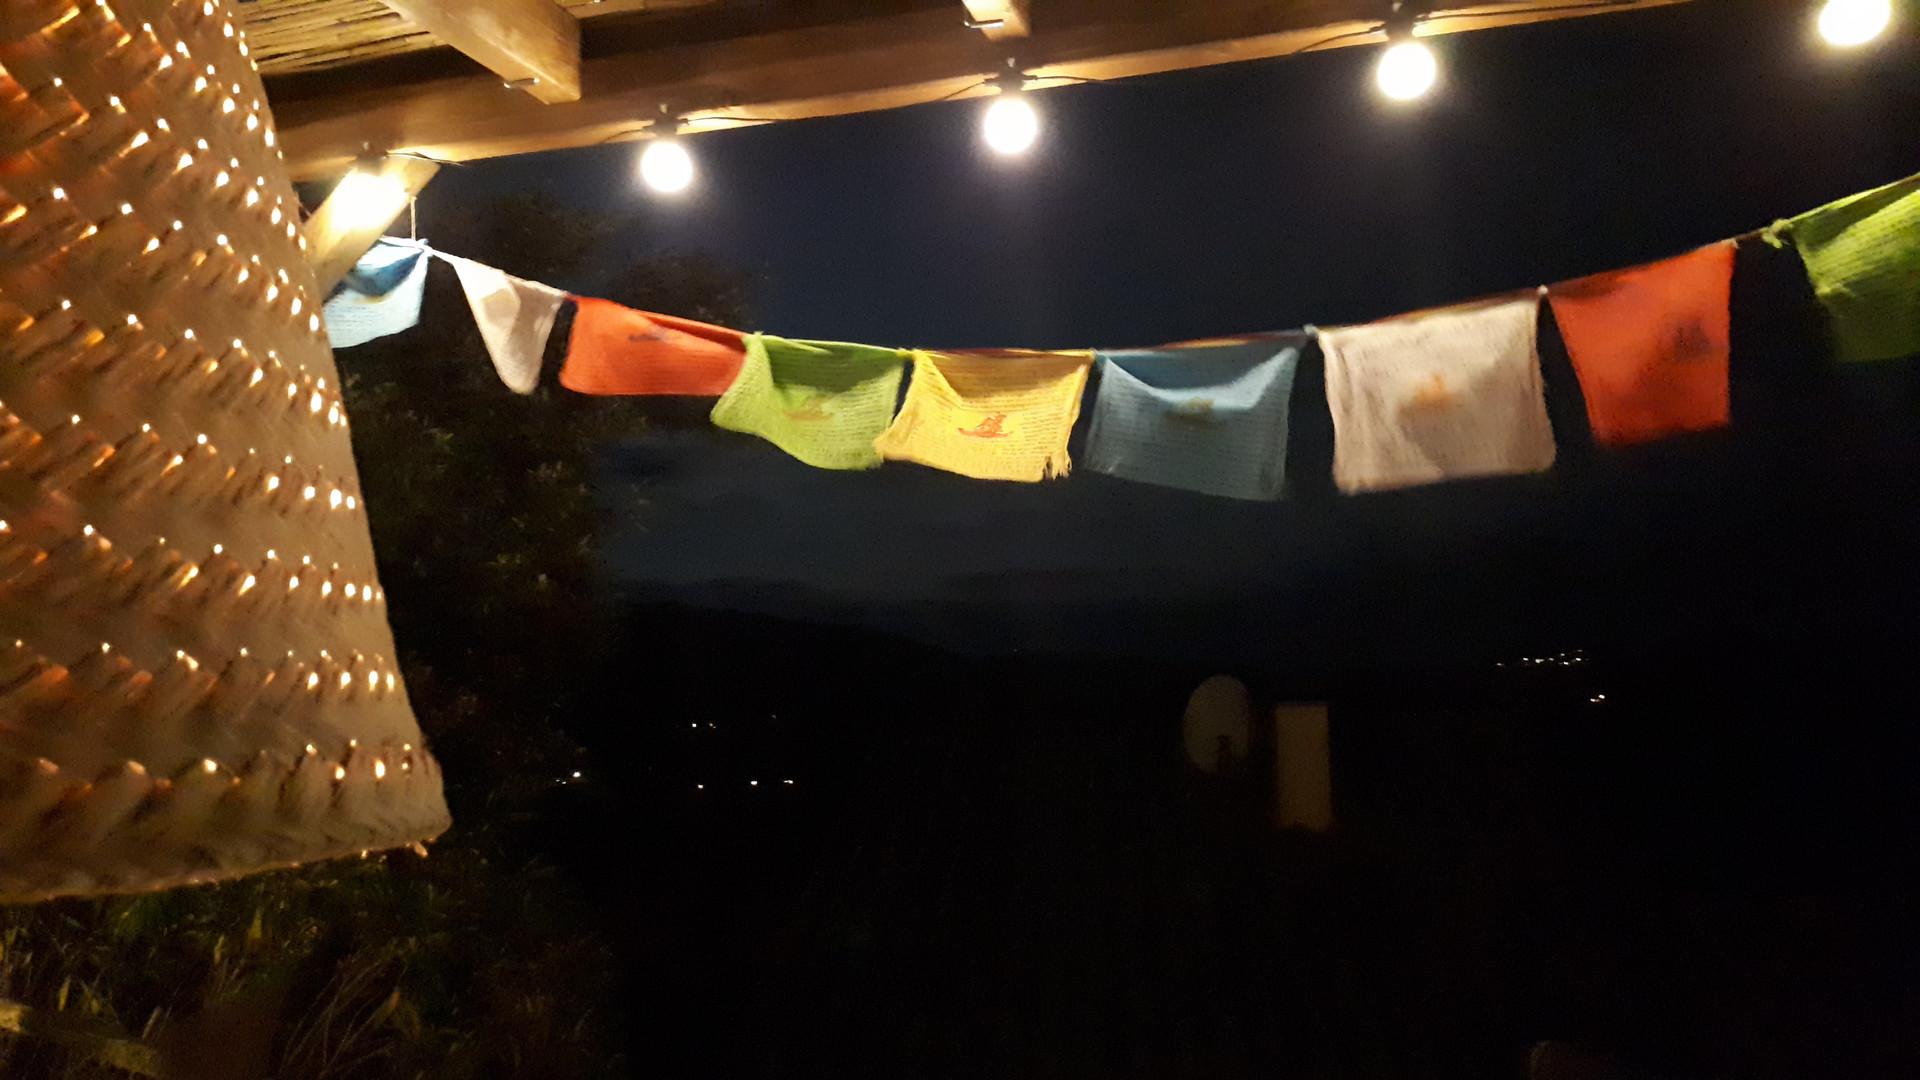 Gazebo by night